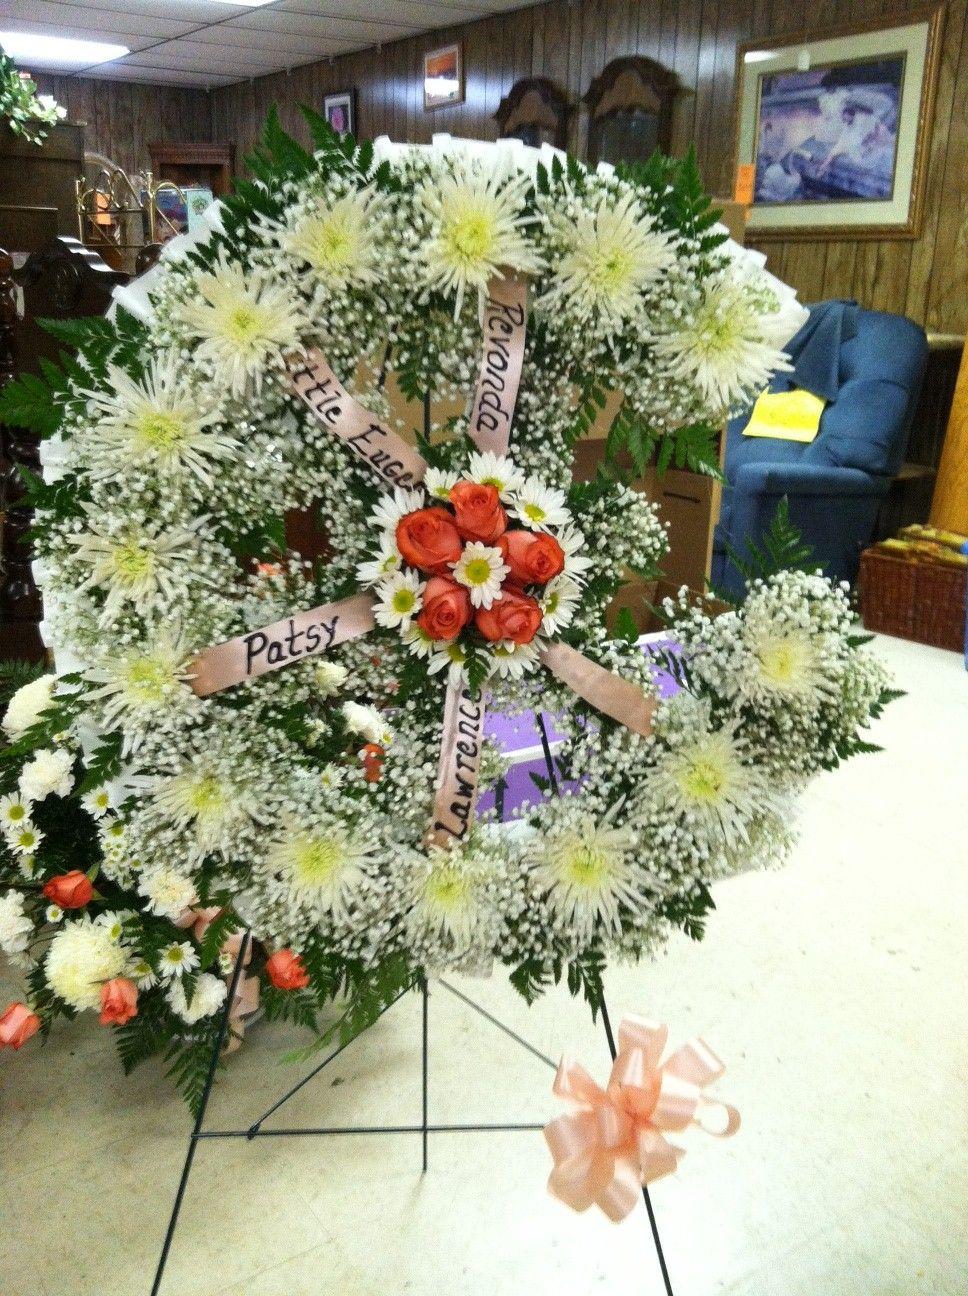 Family spray broken wheel funeral designs pinterest sprays family spray broken wheel funeral designs pinterest sprays floral arrangement and flowers izmirmasajfo